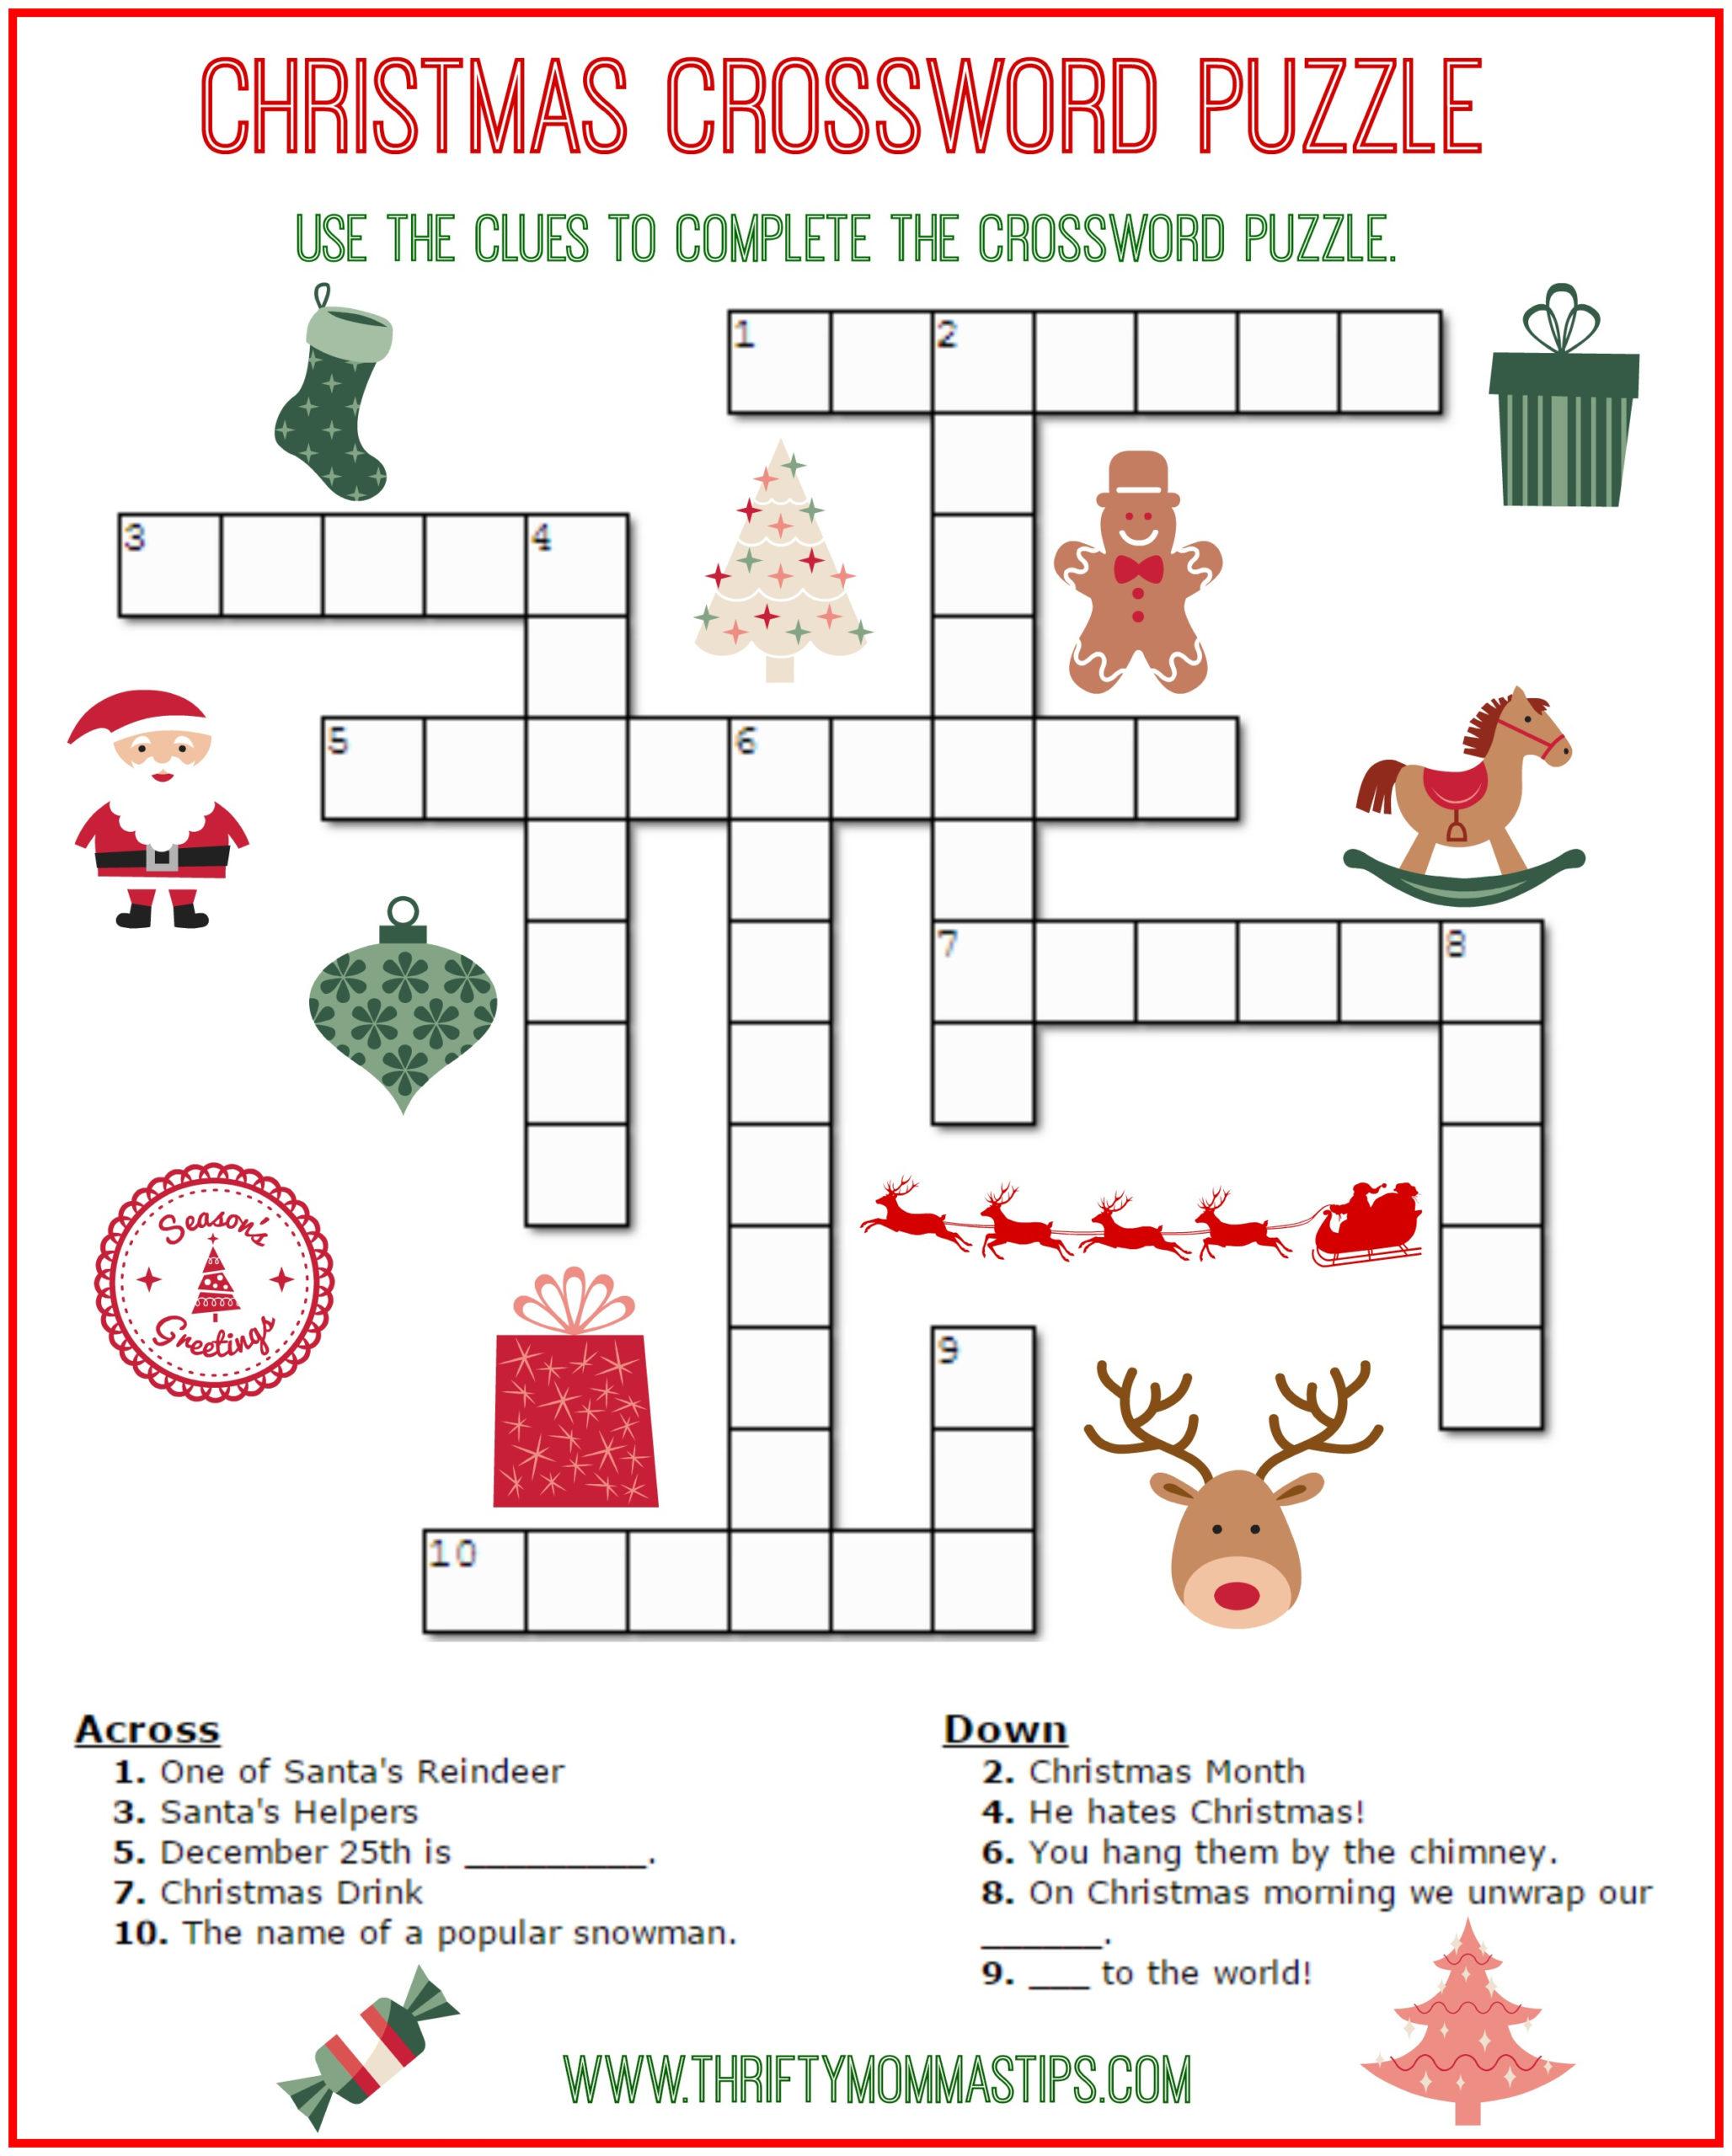 Christmas Crossword Puzzle Printable Free